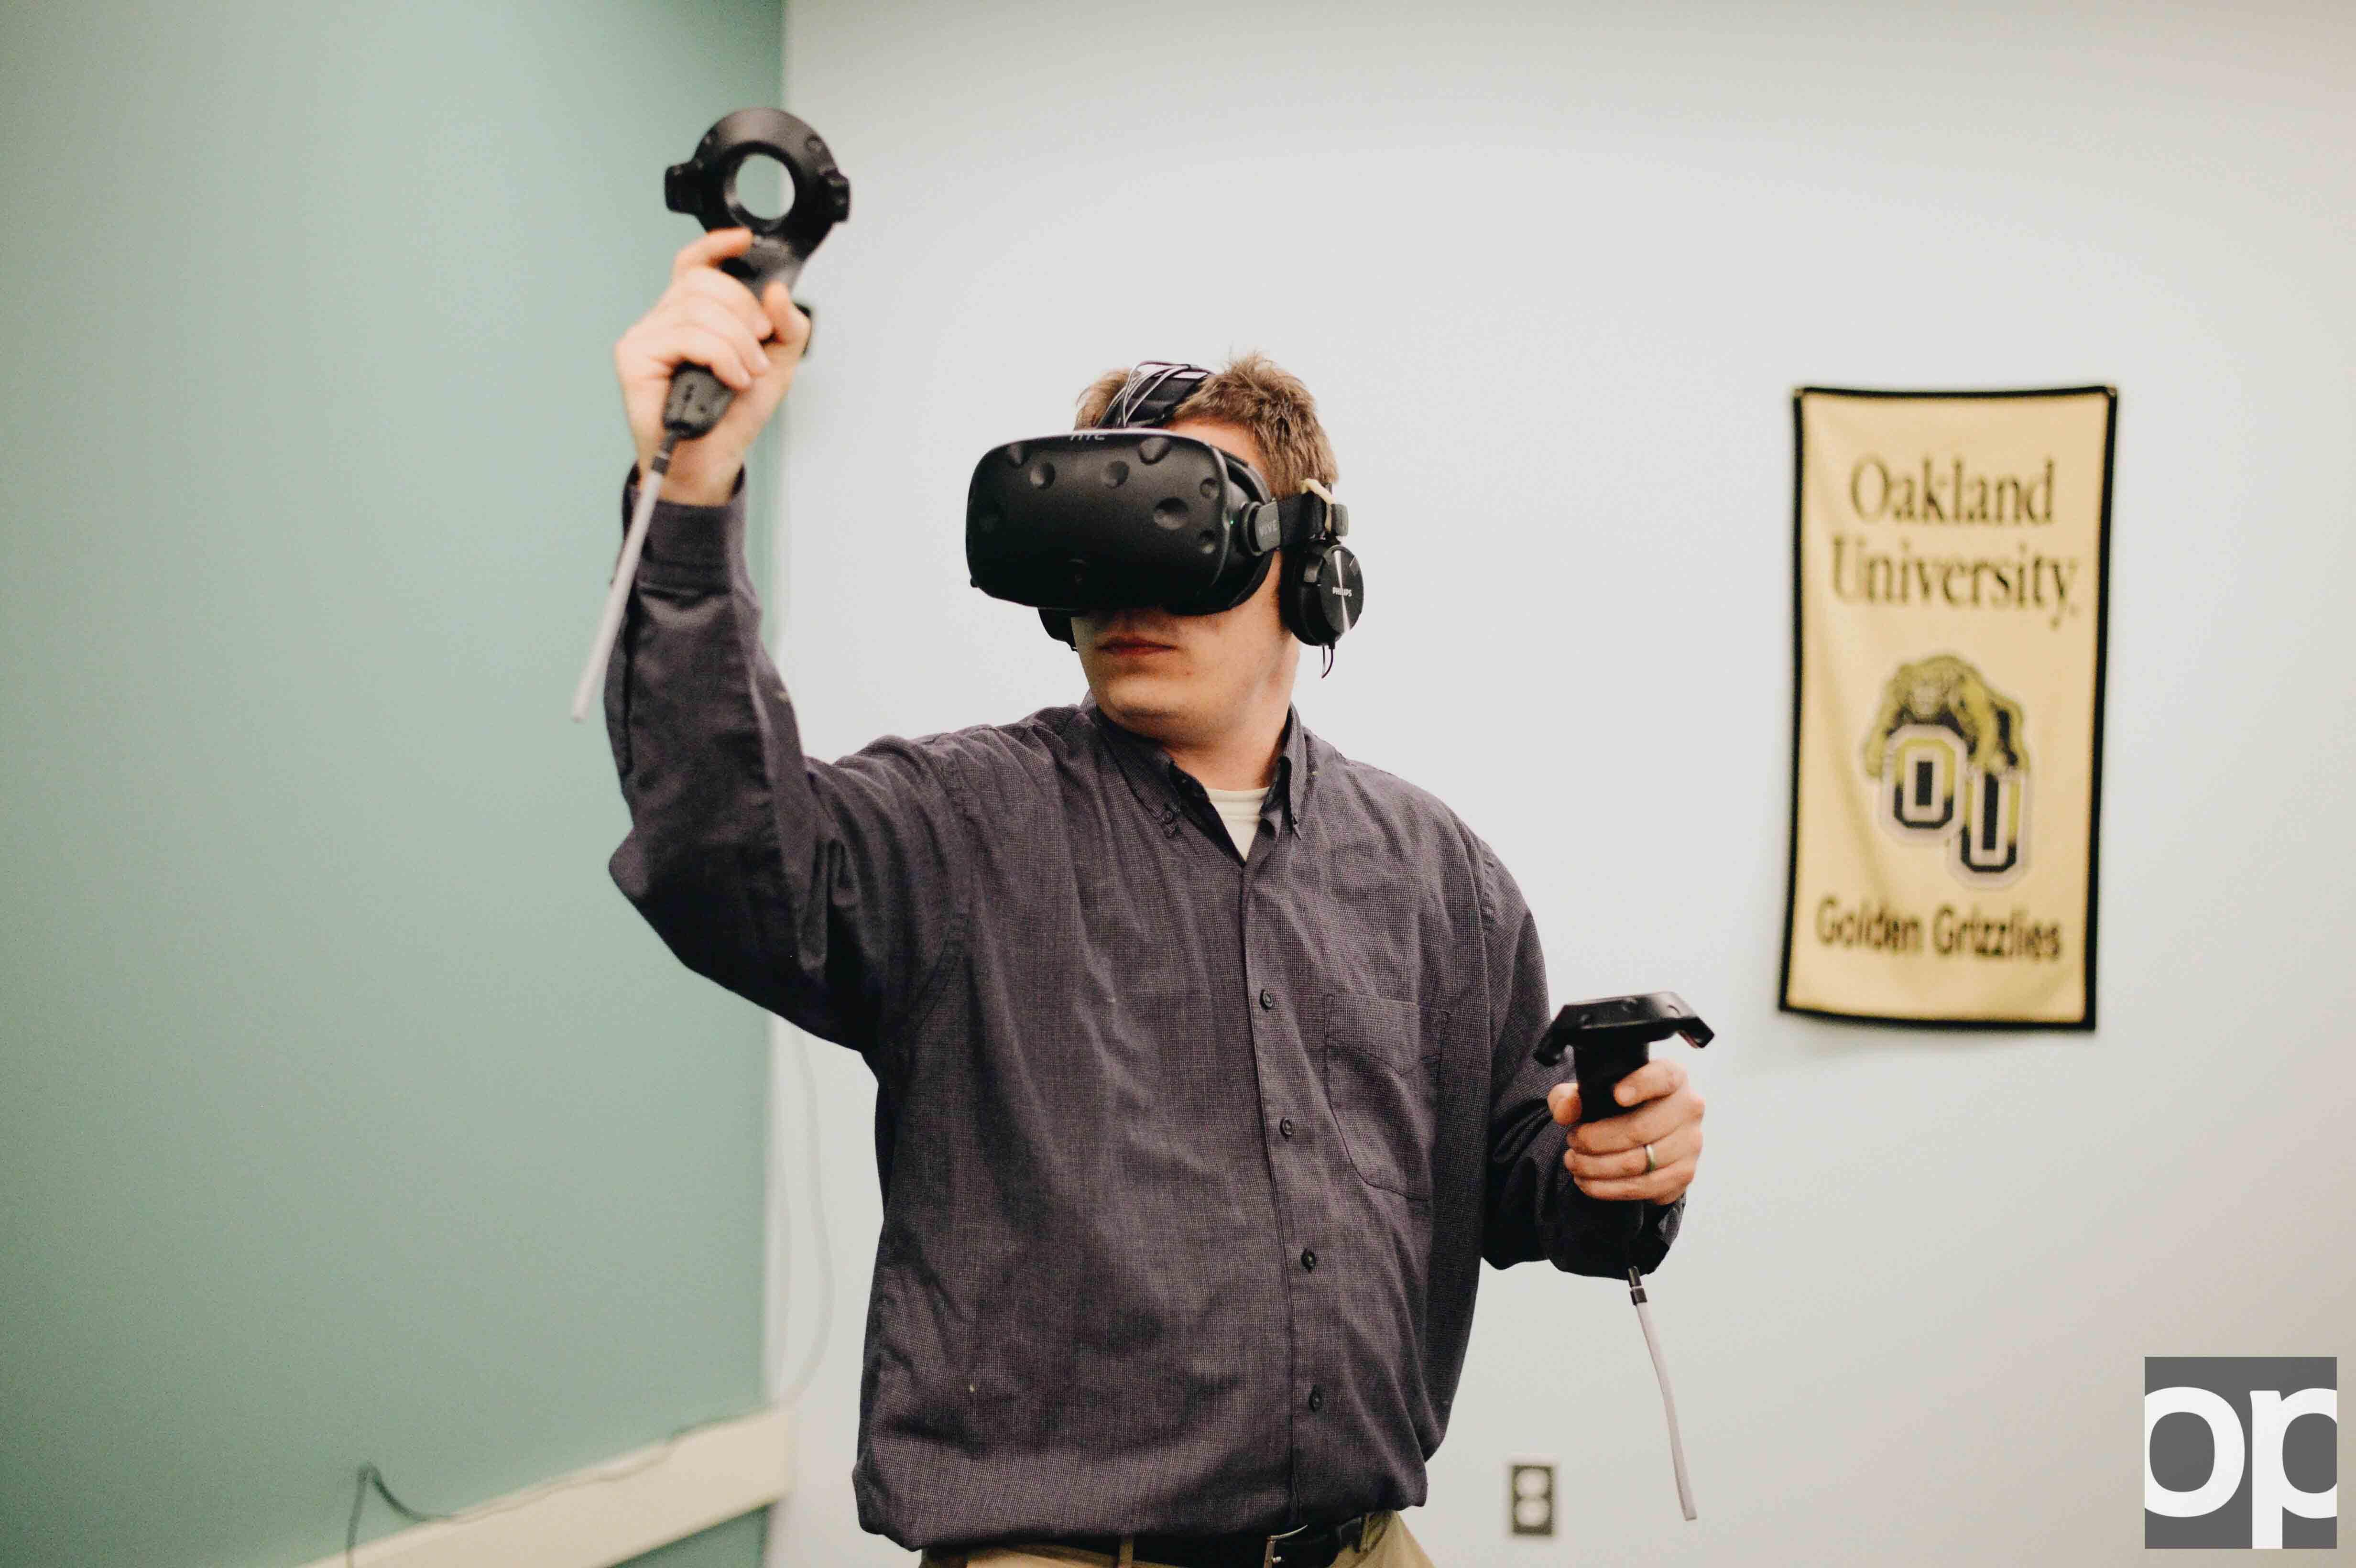 Matt Switlik tests out the new virtual reality program.